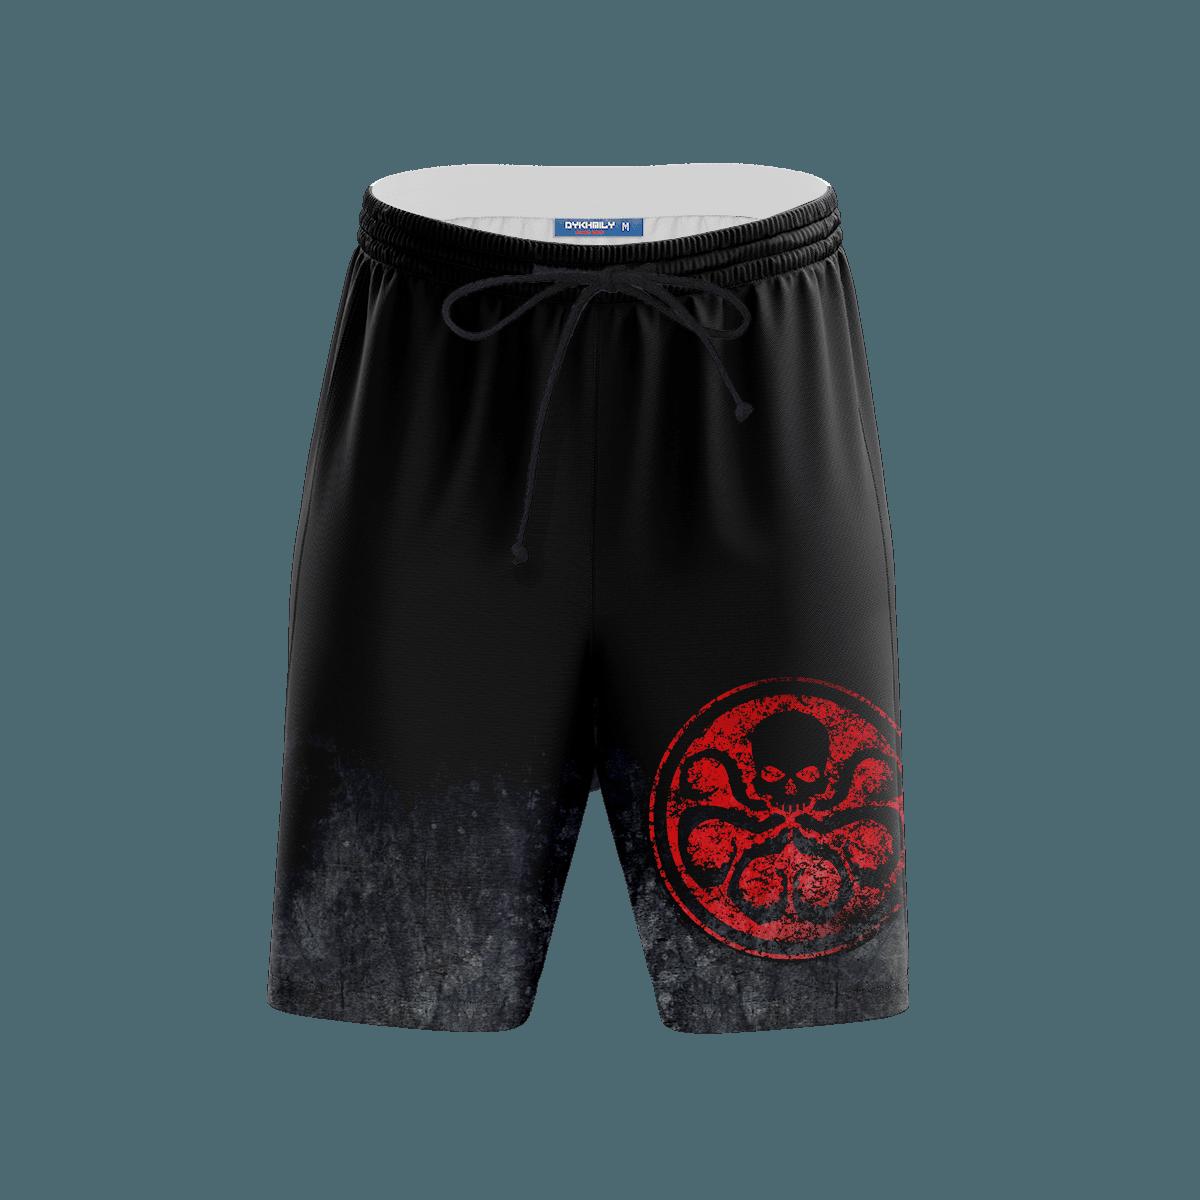 Hail Hydra Beach Shorts FDM3107 S Official Anime Swimsuit Merch